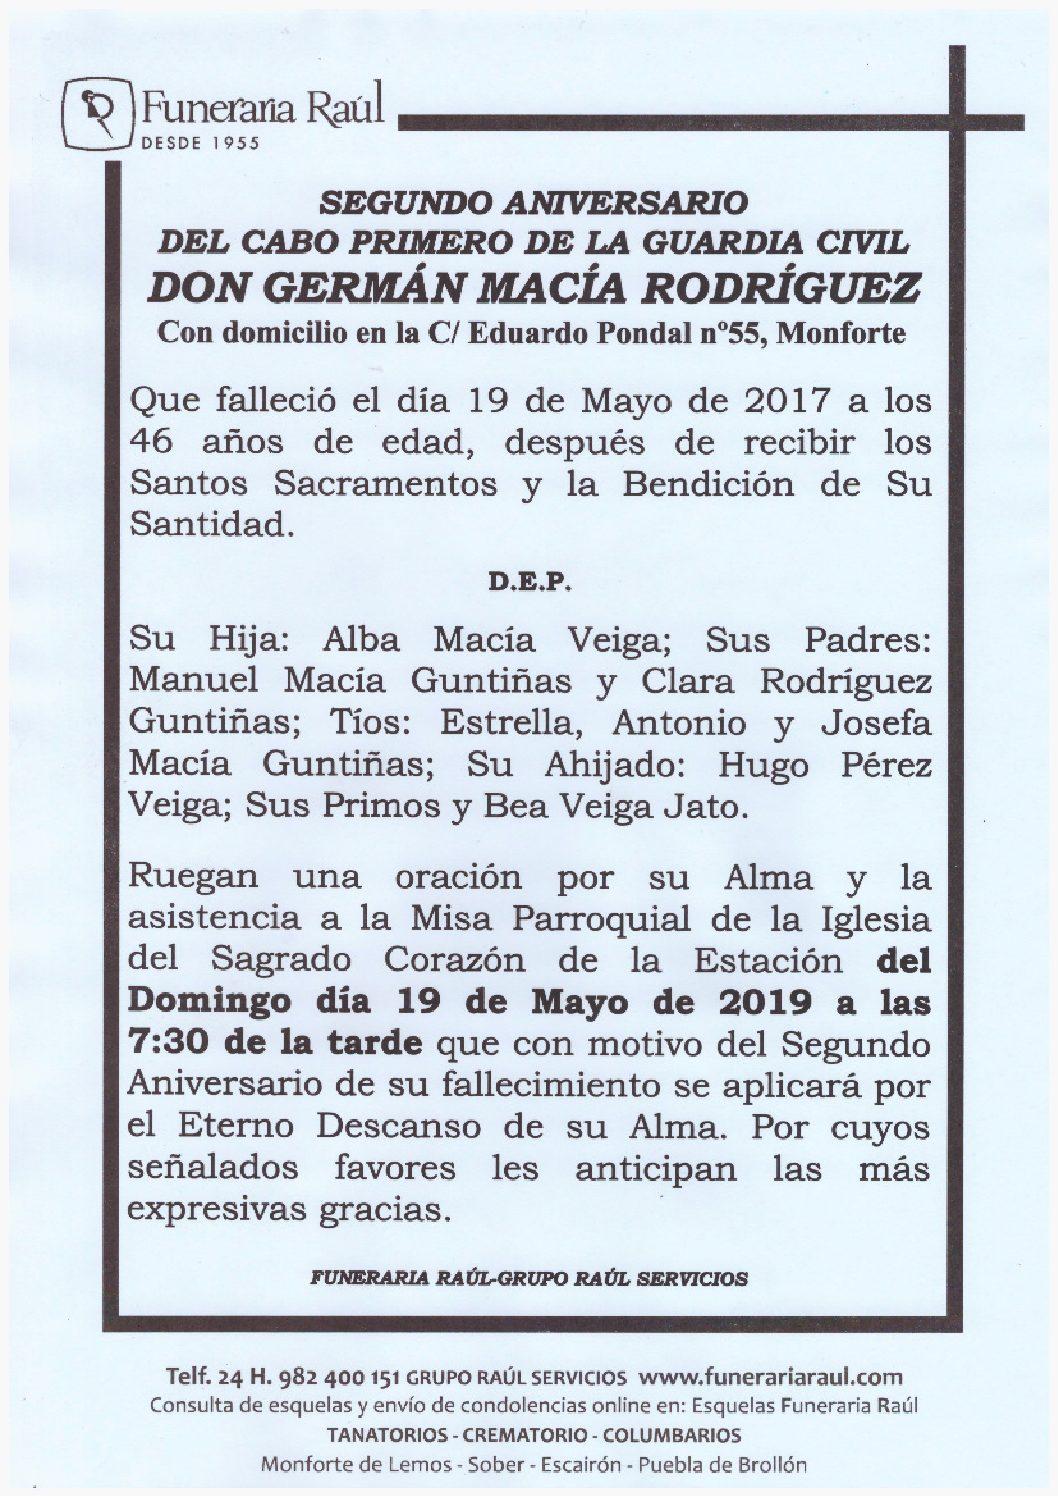 SEGUNDO ANIVERSARIO DE DON GERMAN MACIA RODRIGUEZ